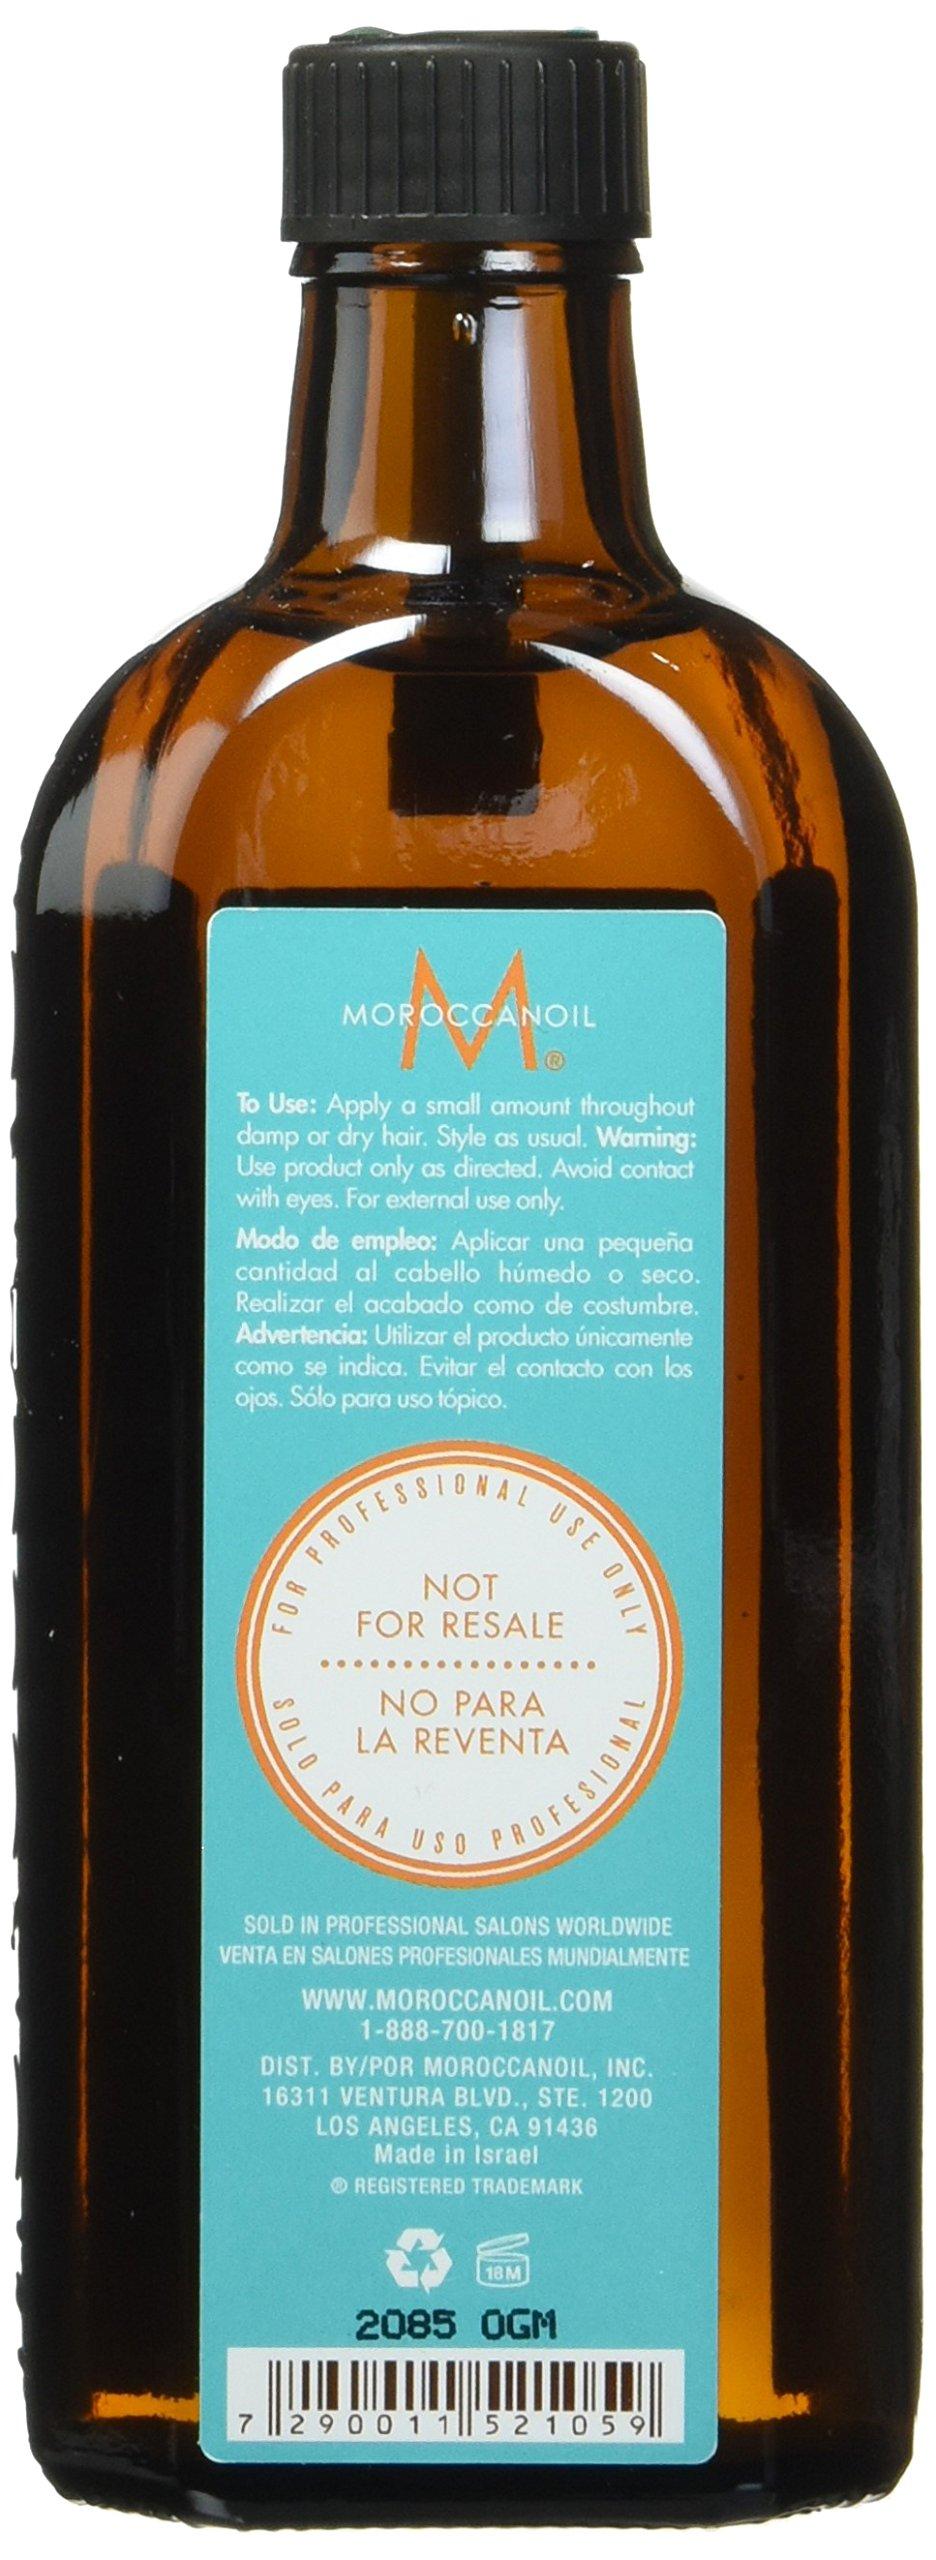 MoroccanOil Hair Treatment 6.8oz by MOROCCANOIL (Image #2)